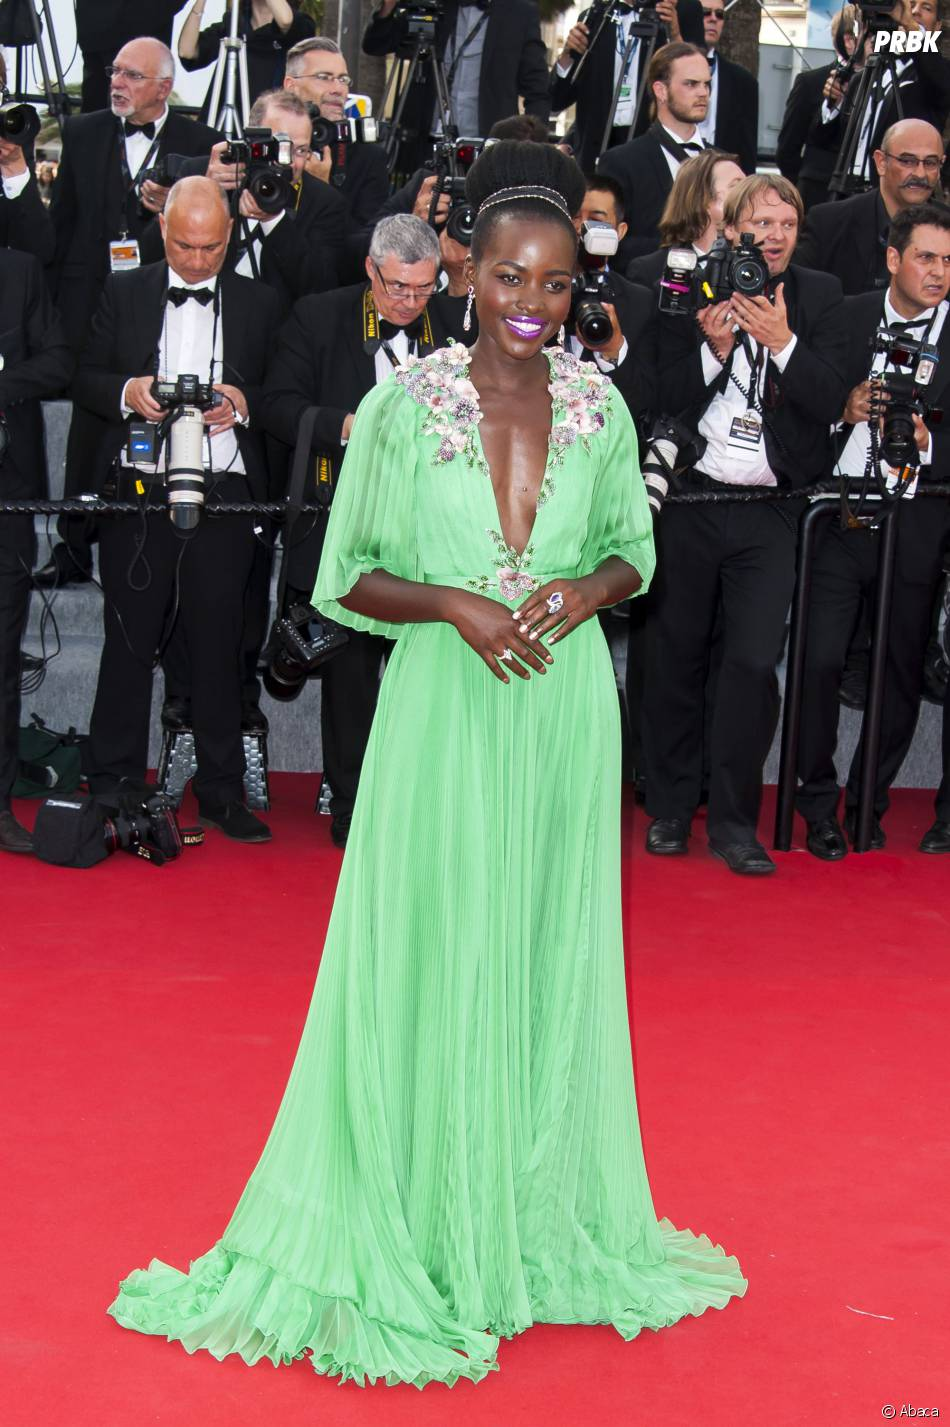 Lupita Nyong'o sur le tapis rouge, le 13 mai 2015 au Festival de Cannes